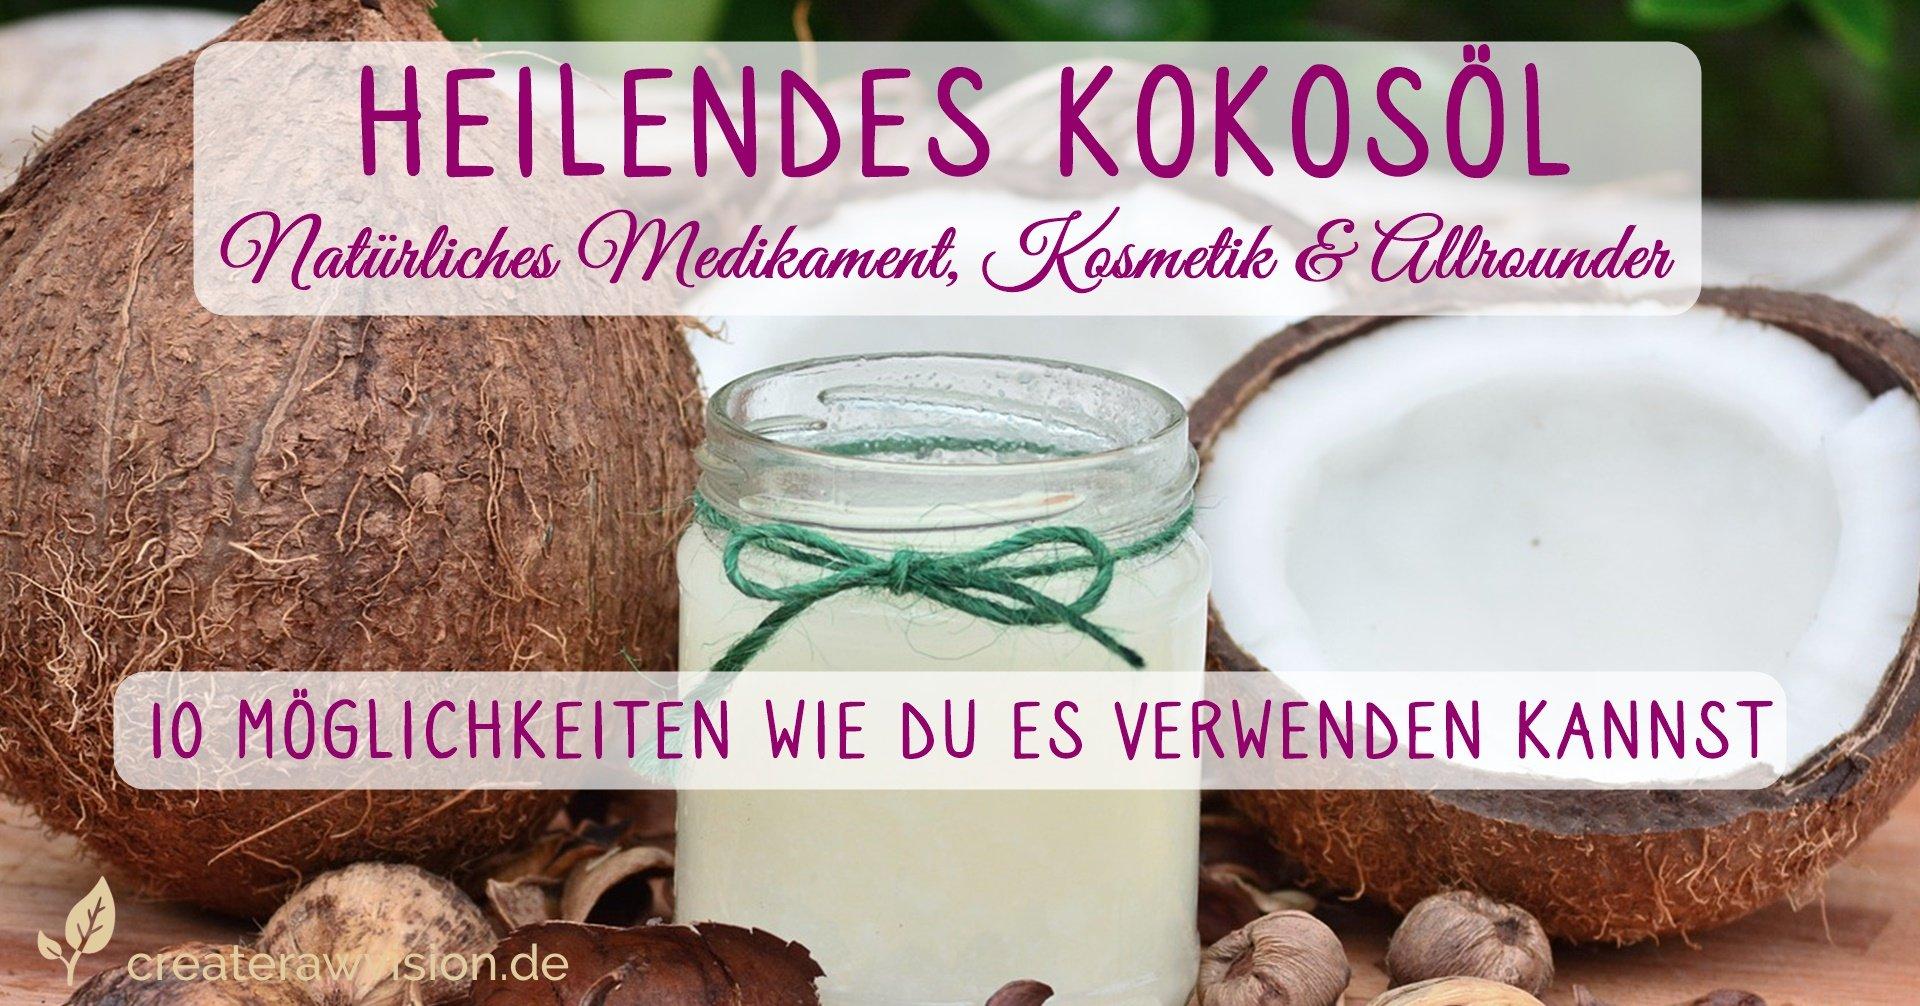 Kokoöl im Glas und Kokosnüsse